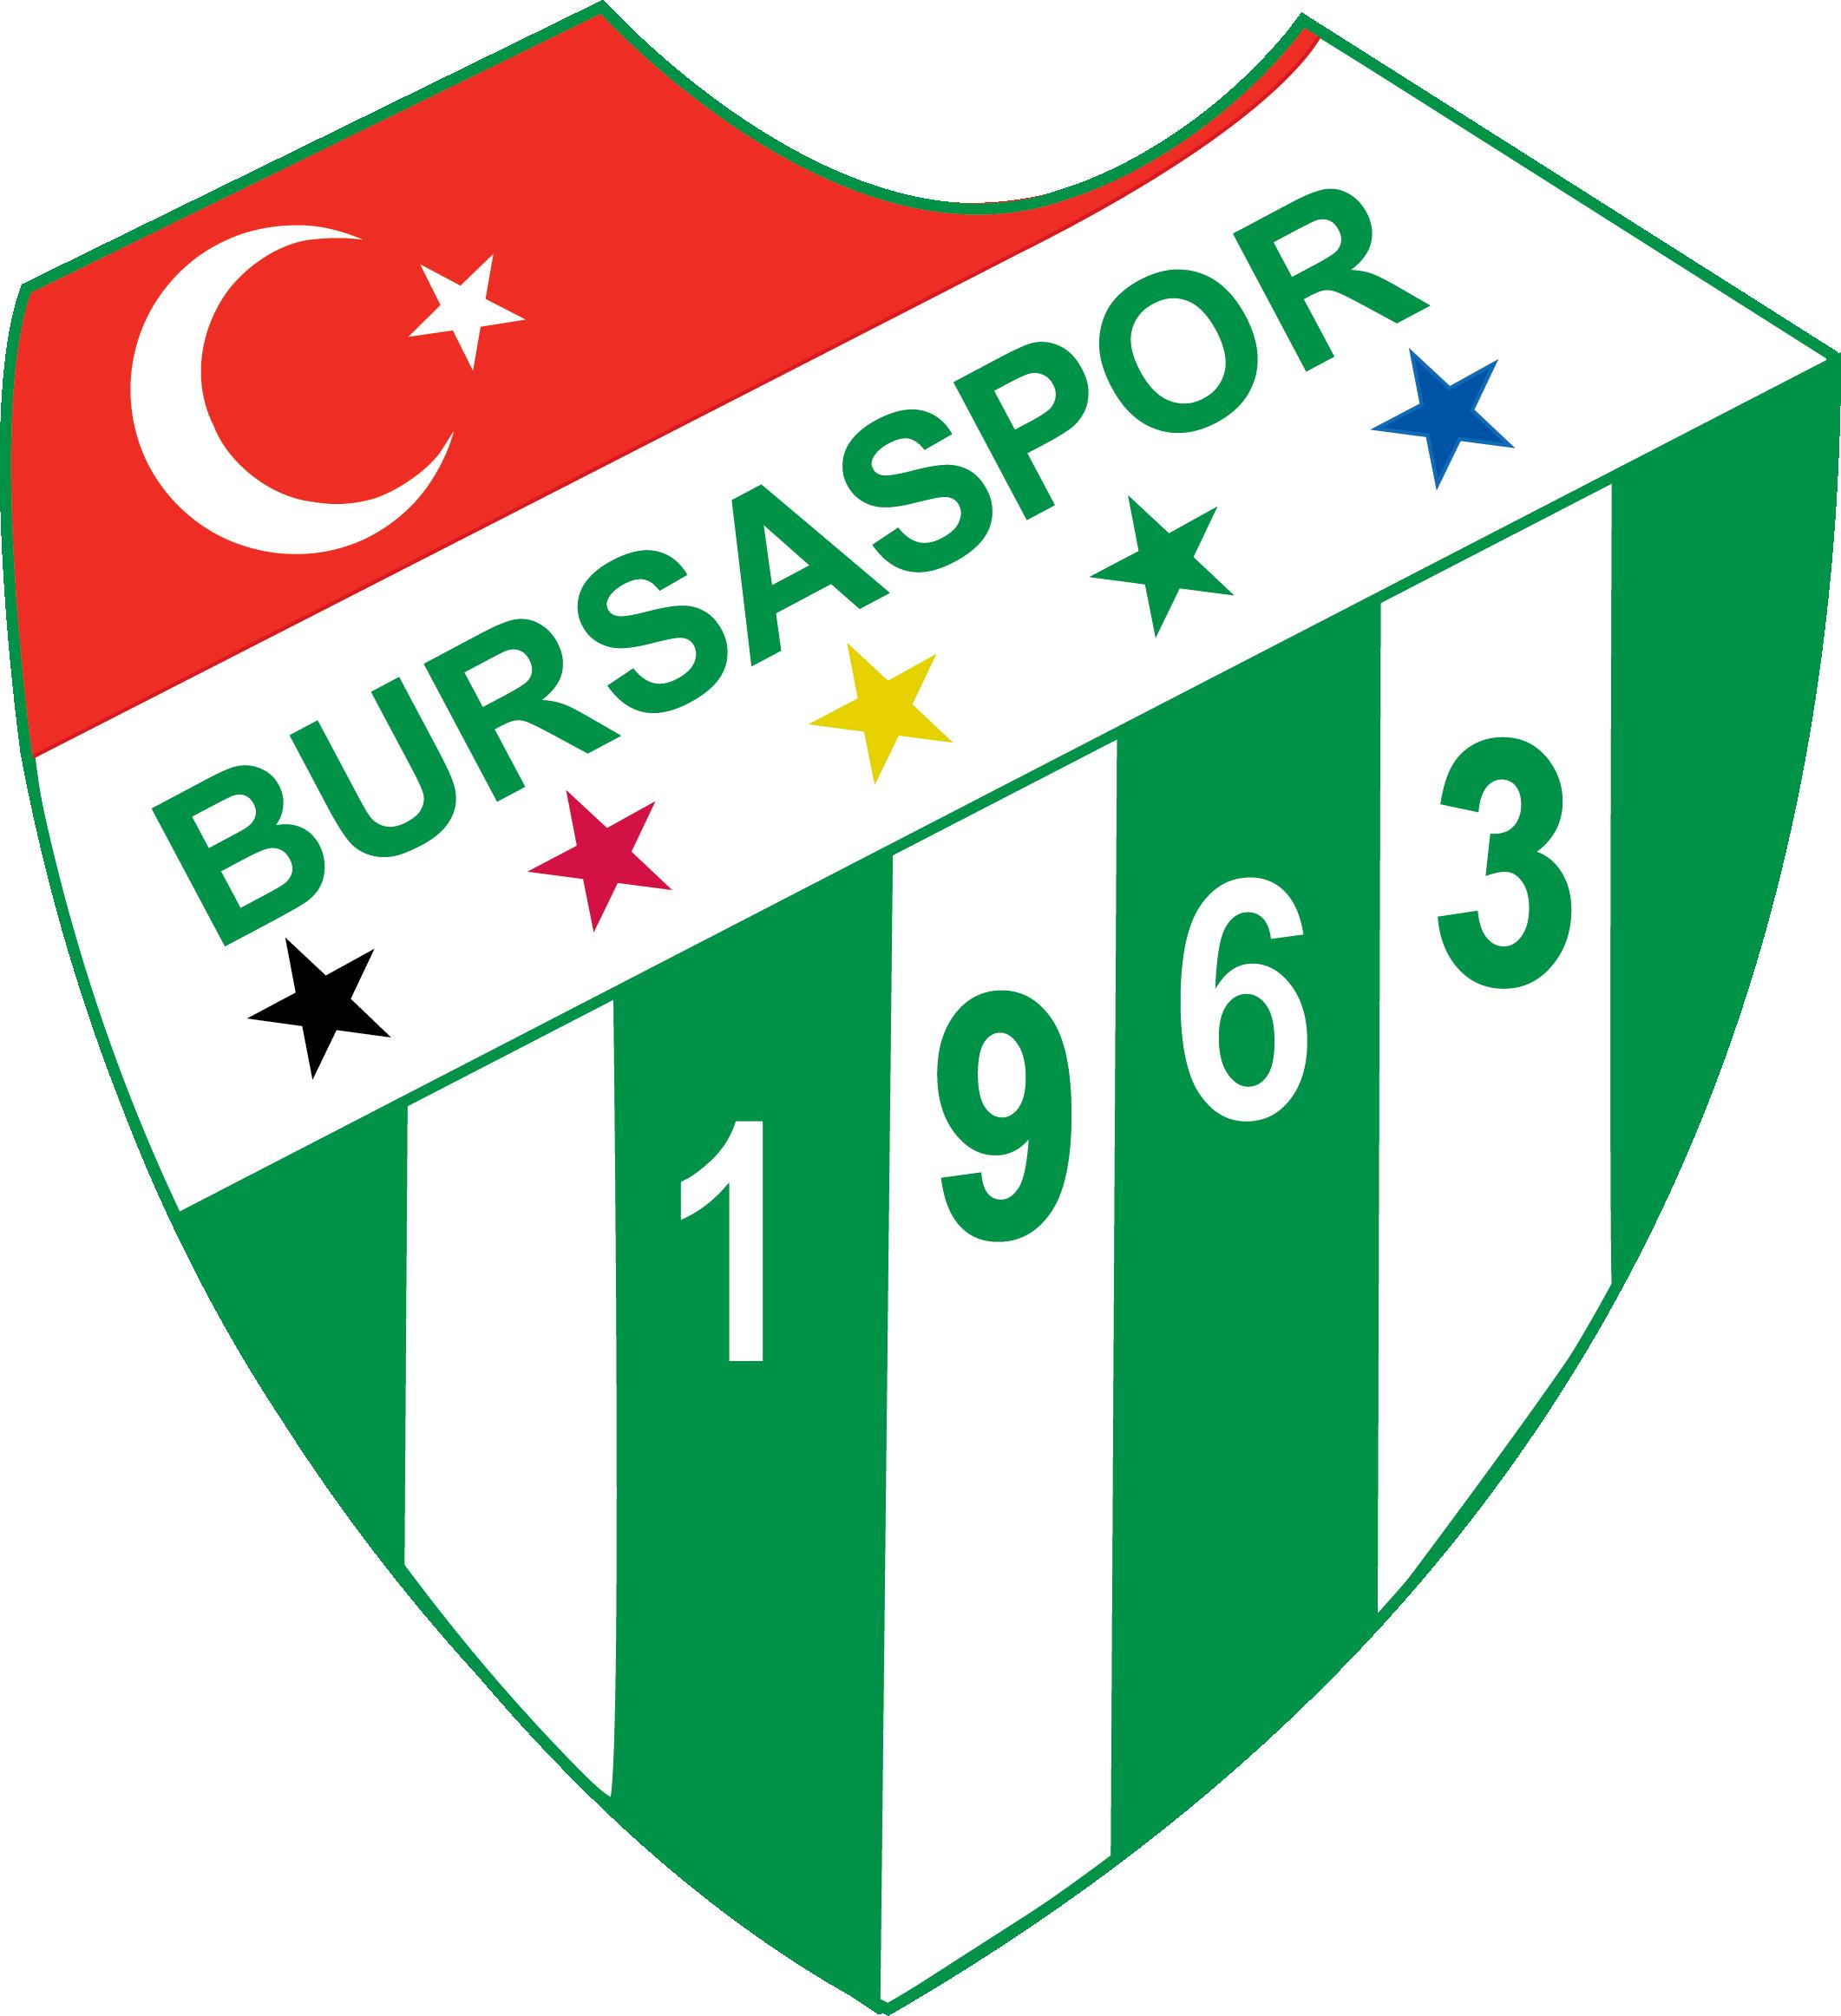 http://www.bursaspor.org.tr/bs/imagesicerik/logo/bursaspor_logo_png_.png